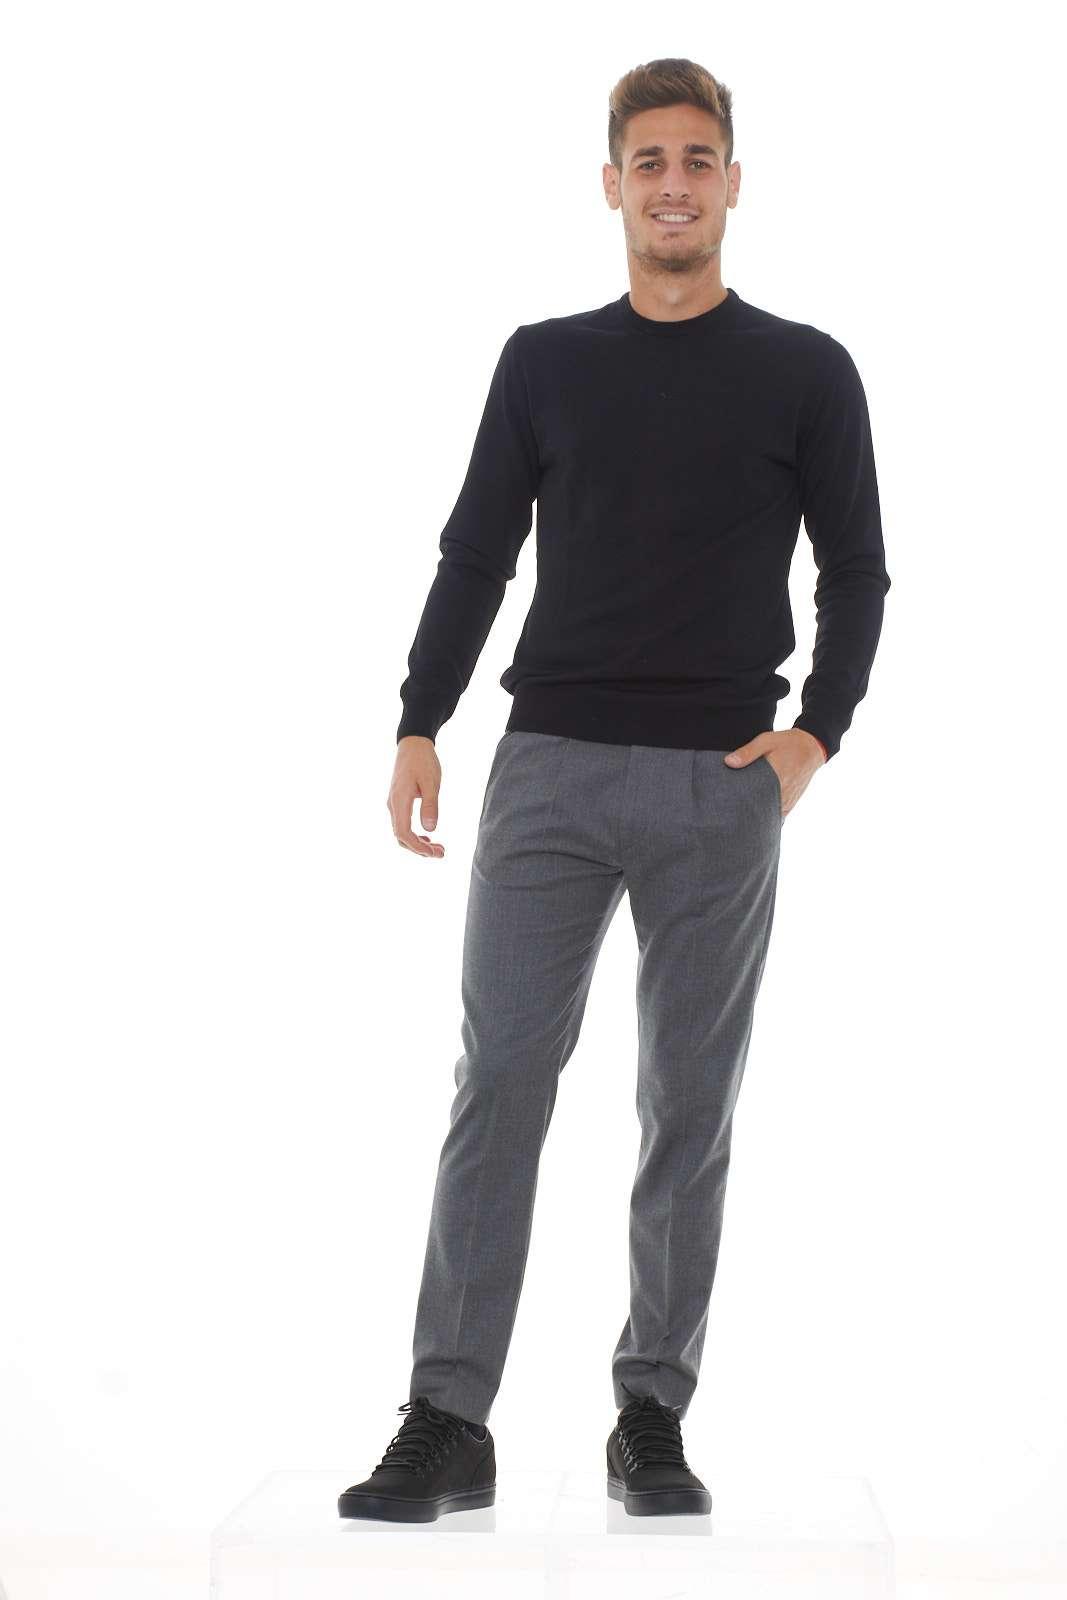 https://www.parmax.com/media/catalog/product/a/i/ai-outlet_parmax-pantaloni-uomo-entre-amis-a198355520-d.jpg